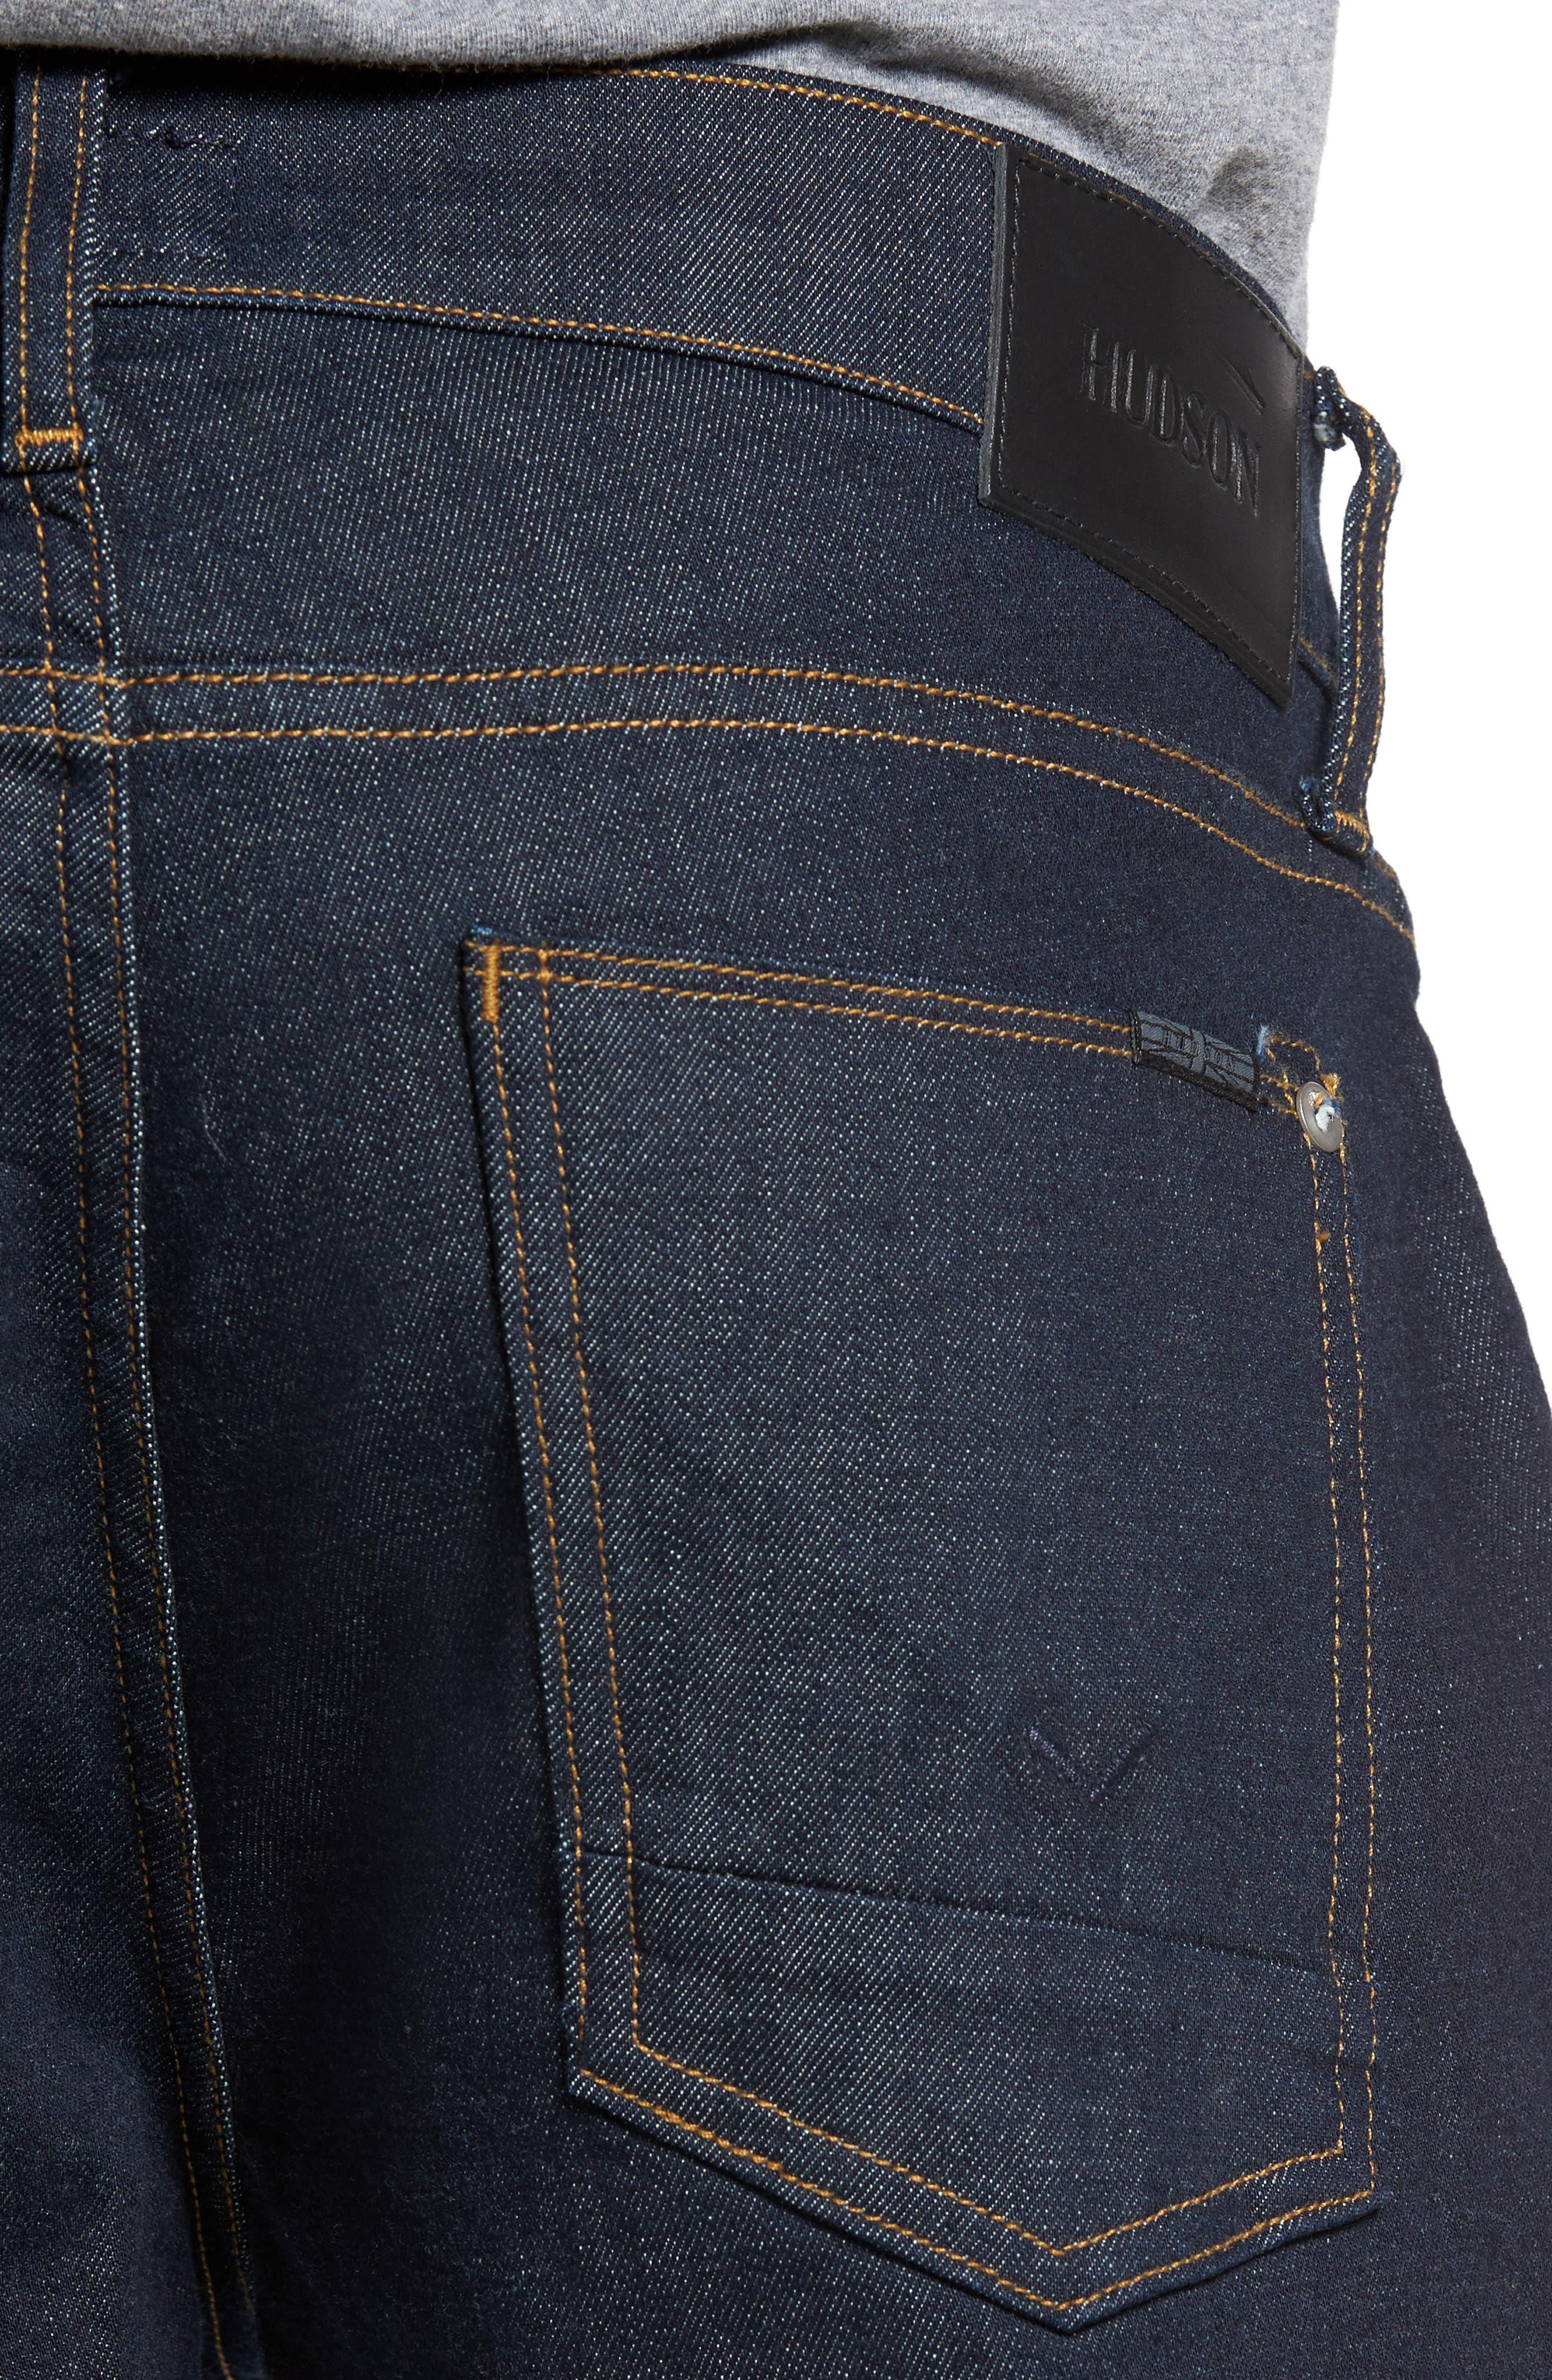 Blake Slim Fit Jeans,                             Alternate thumbnail 4, color,                             410